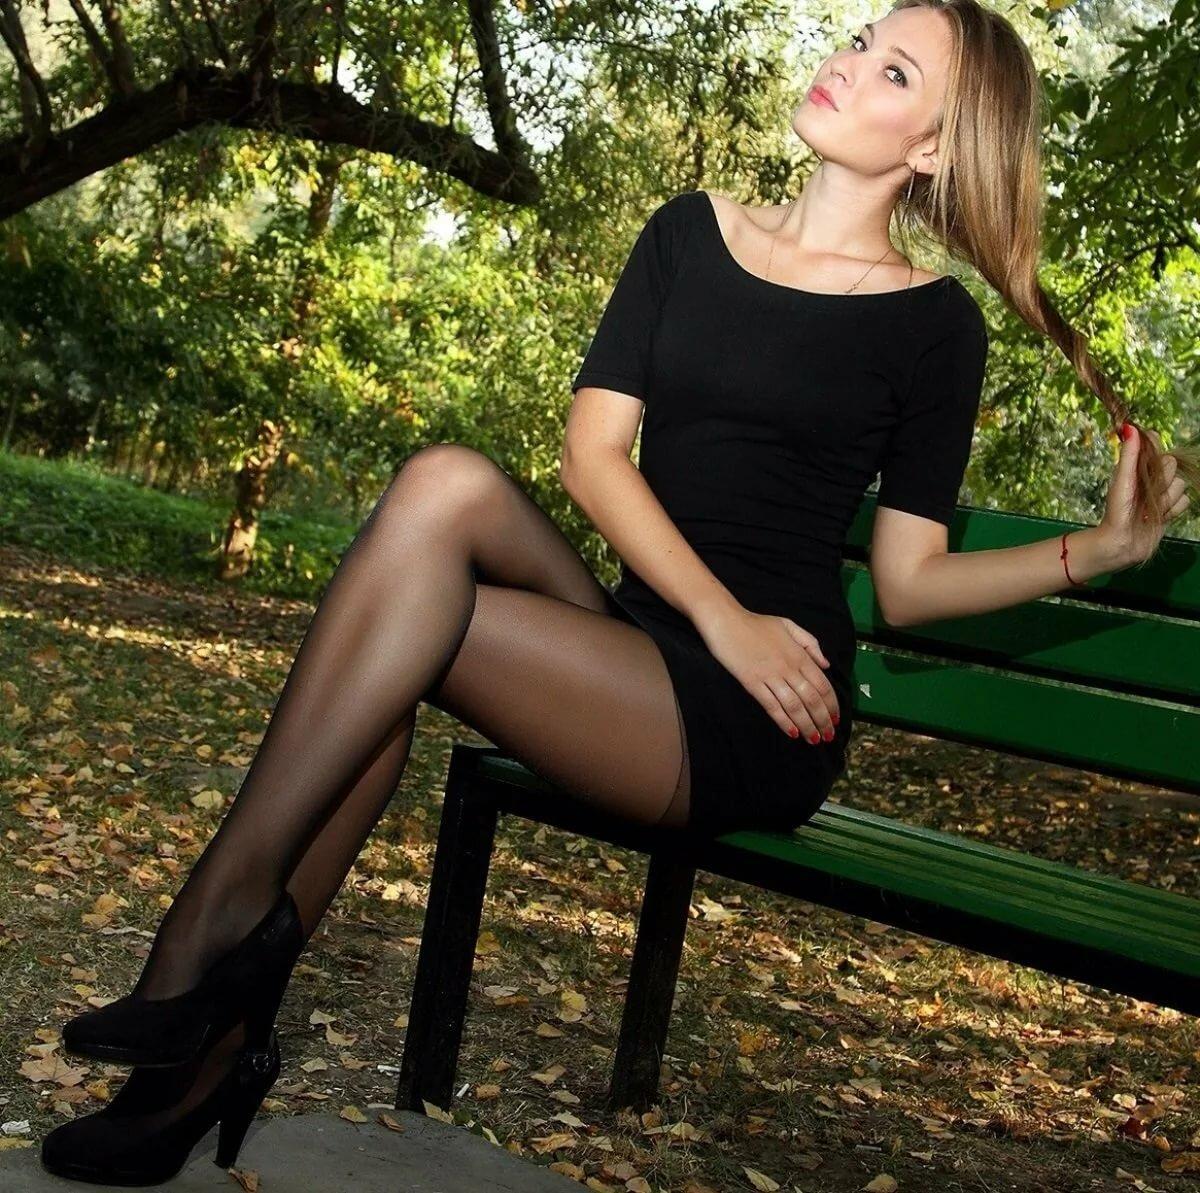 Ебут женские ножки в чулках фото частное моя